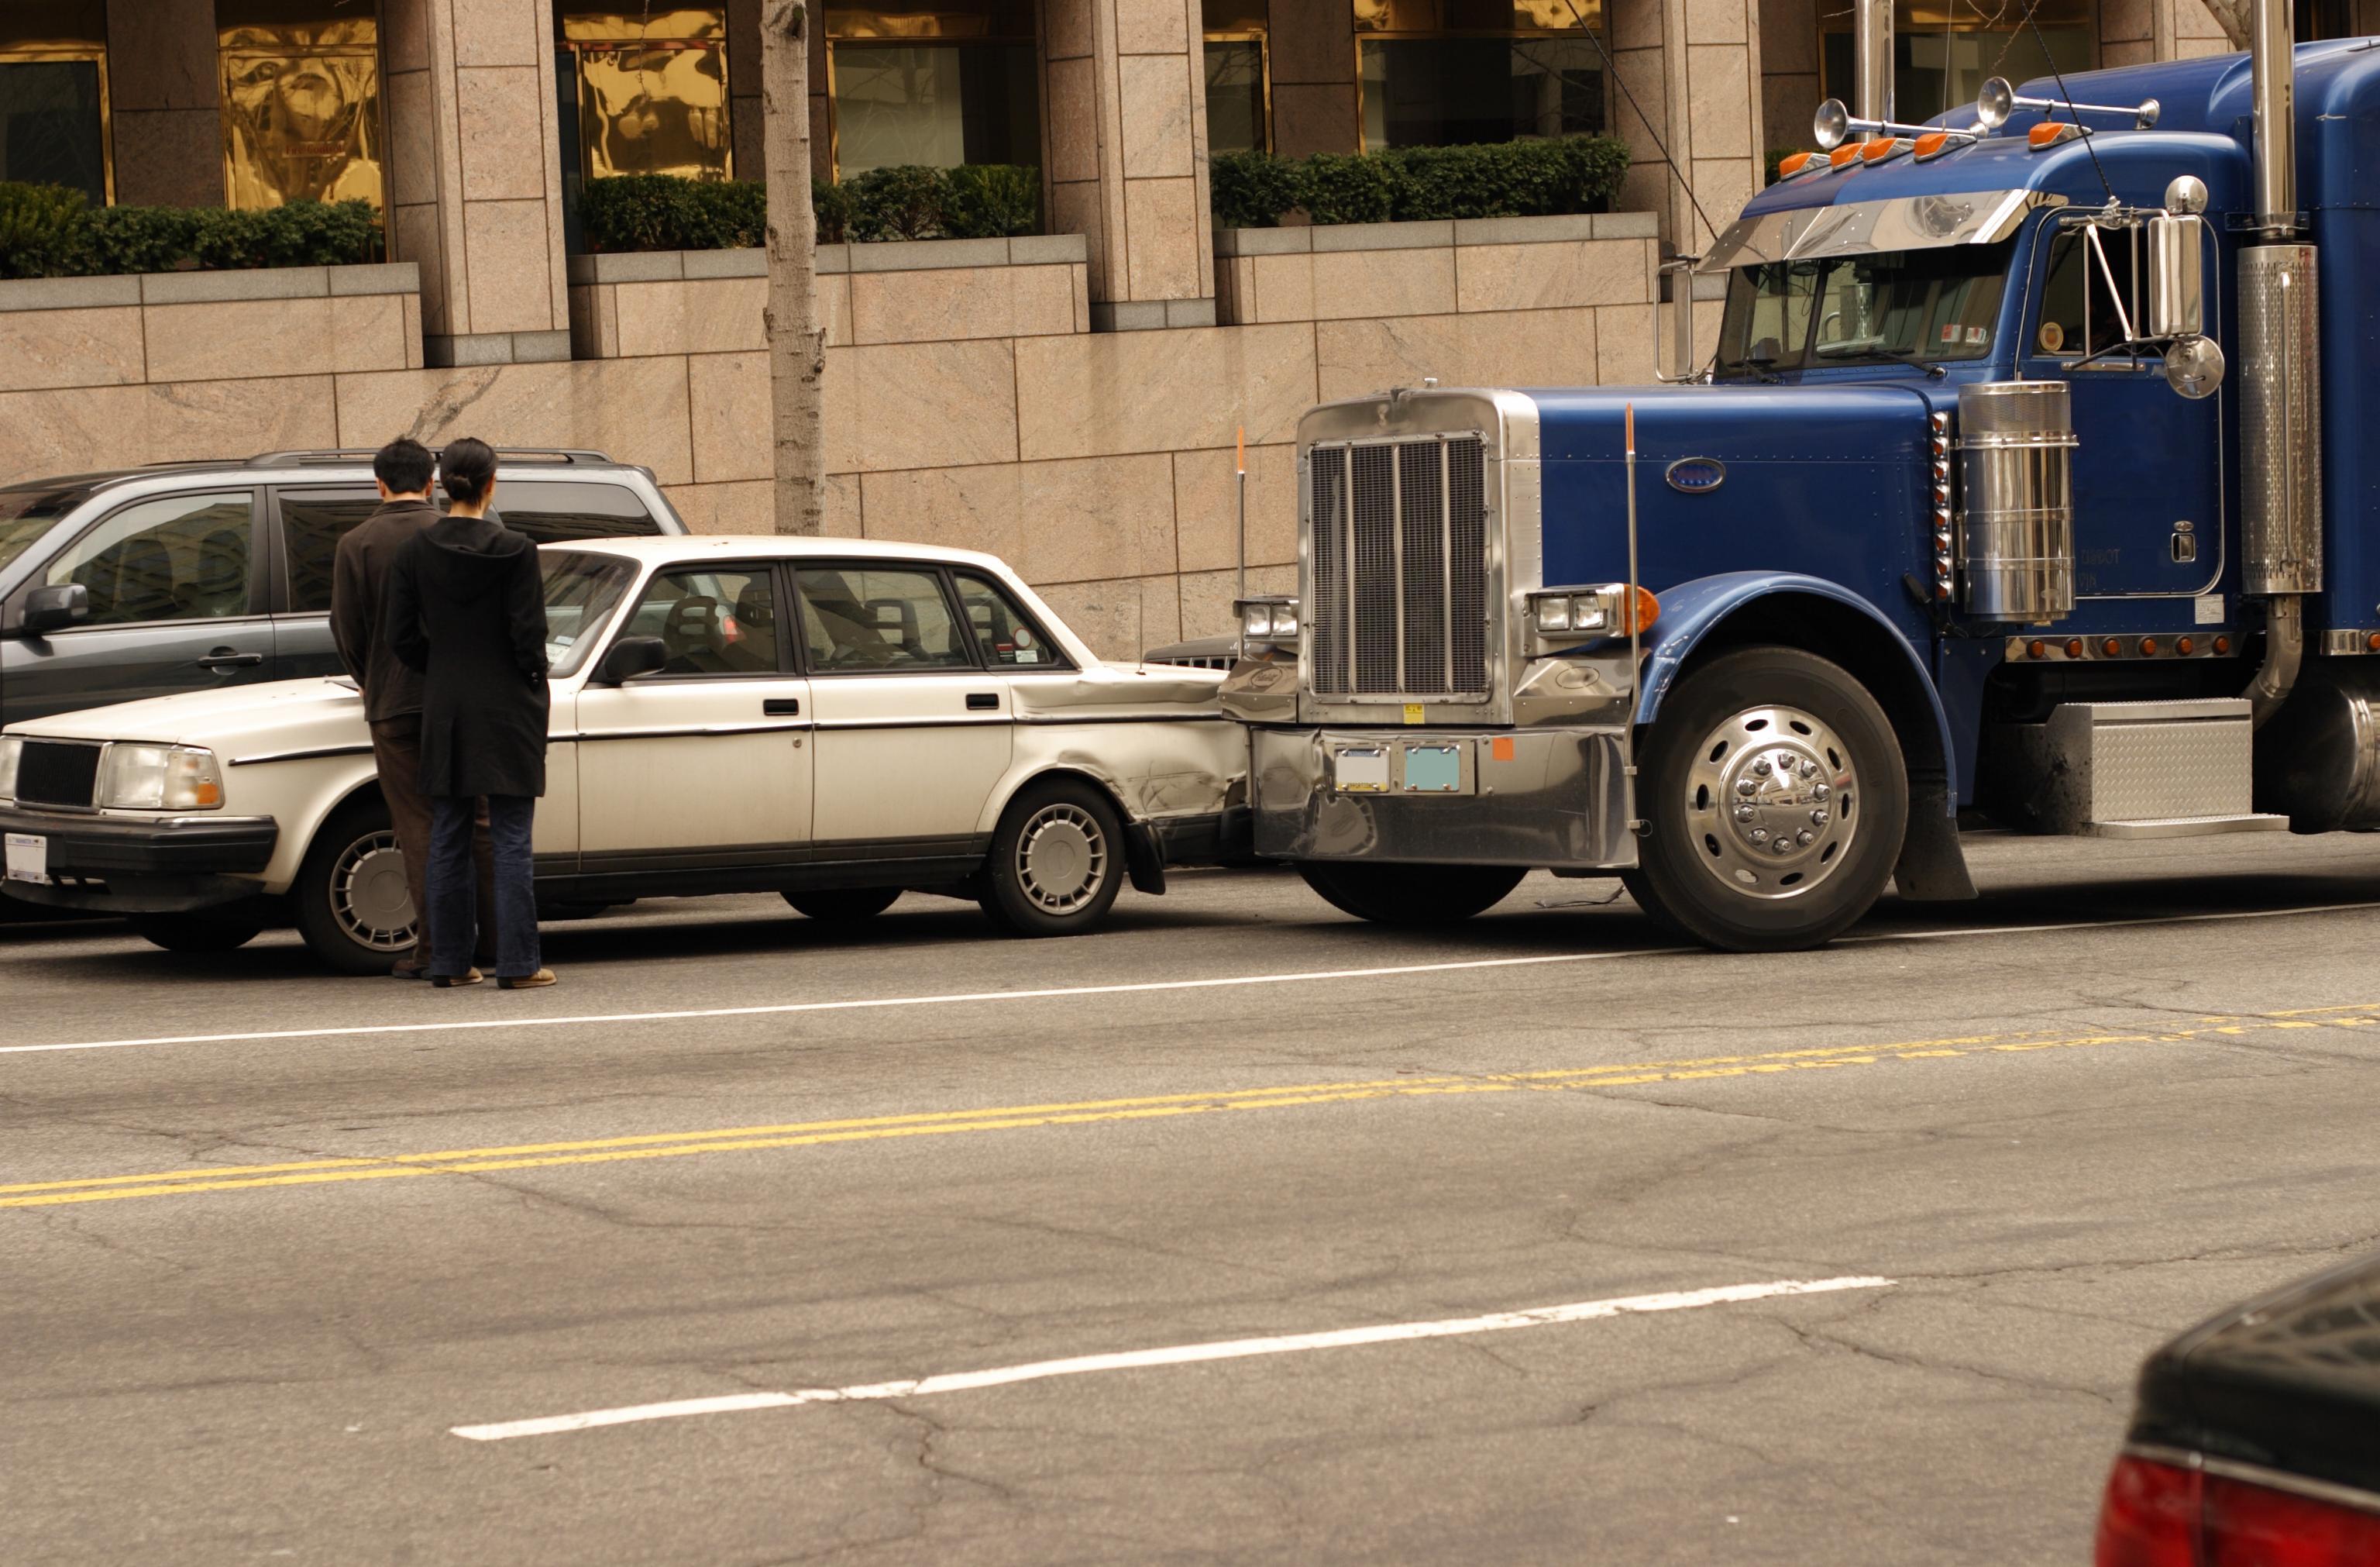 Semi truck crash with car